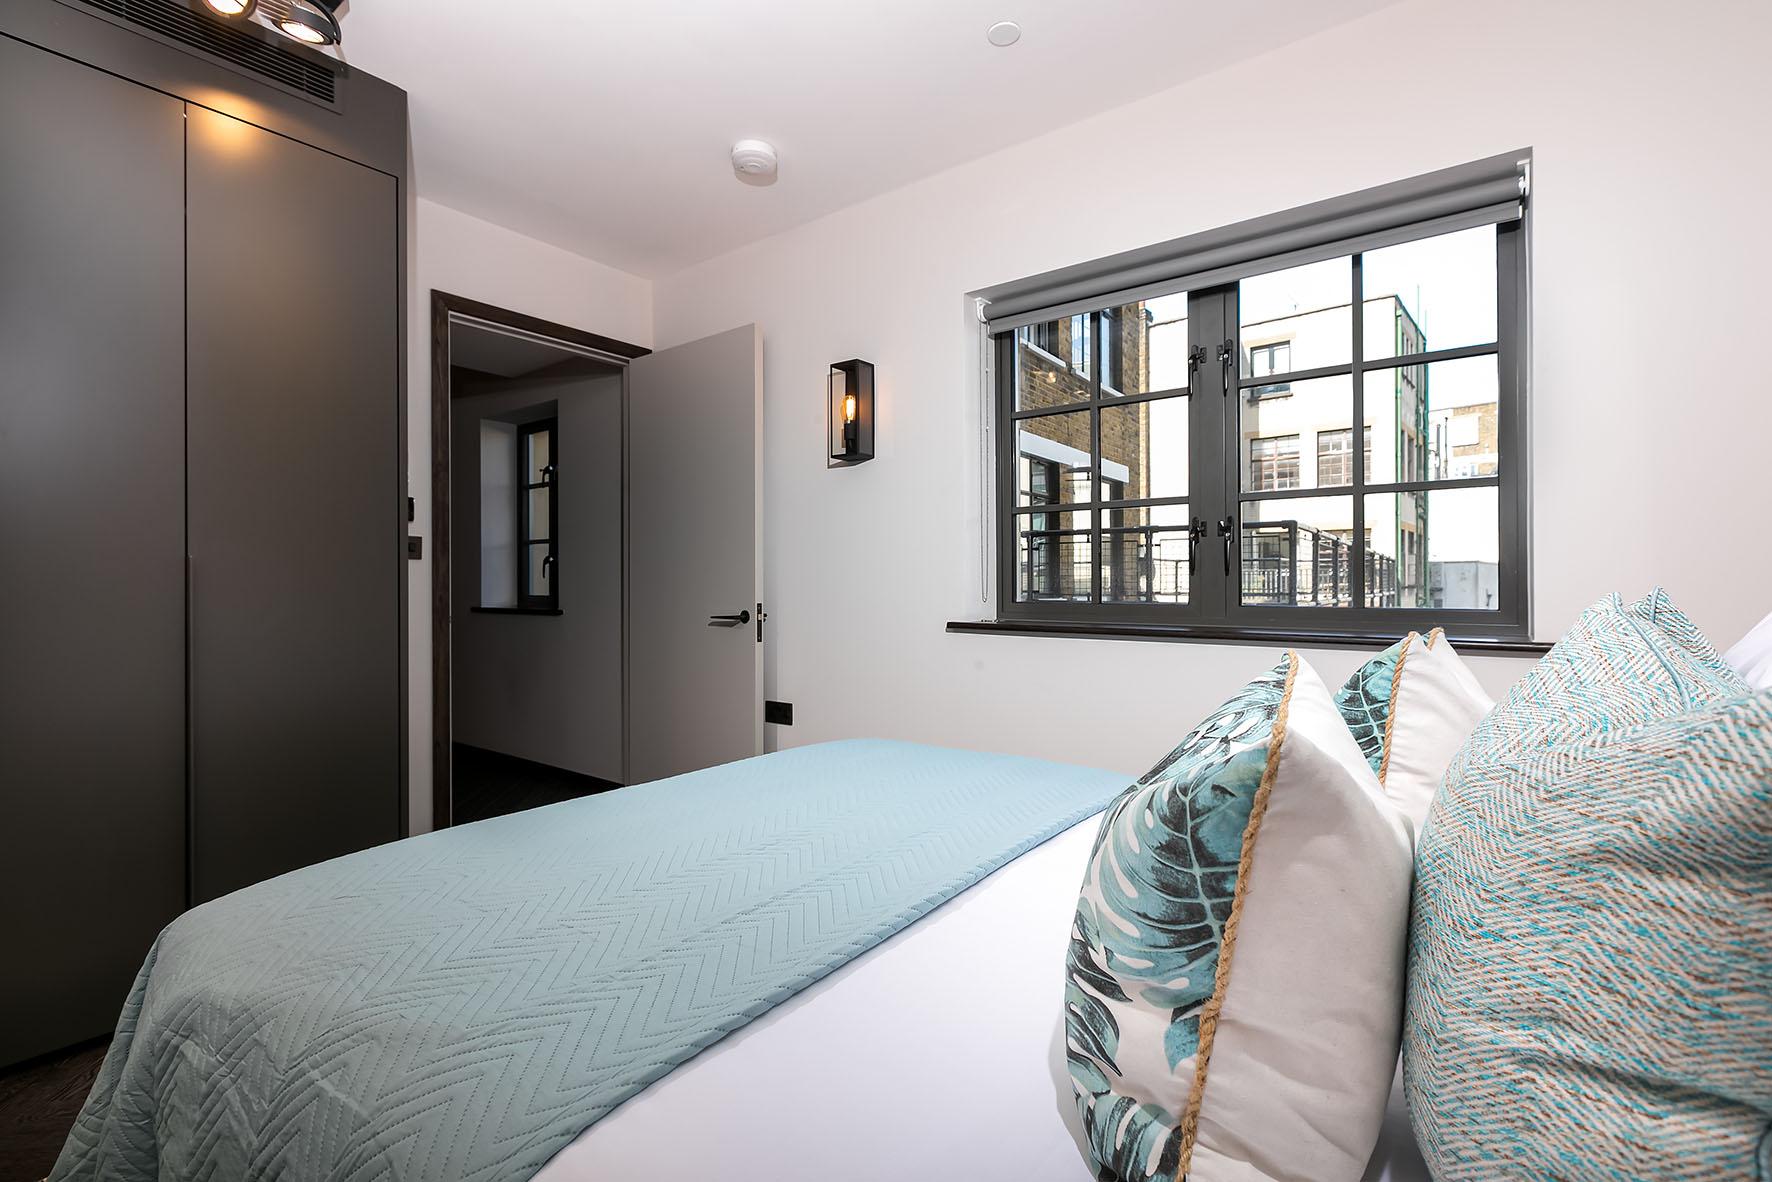 Lovelydays luxury service apartment rental - London - Soho - Oxford Street V - Lovelysuite - 1 bedrooms - 1 bathrooms - Queen bed - 5f0579a9744a - Lovelydays